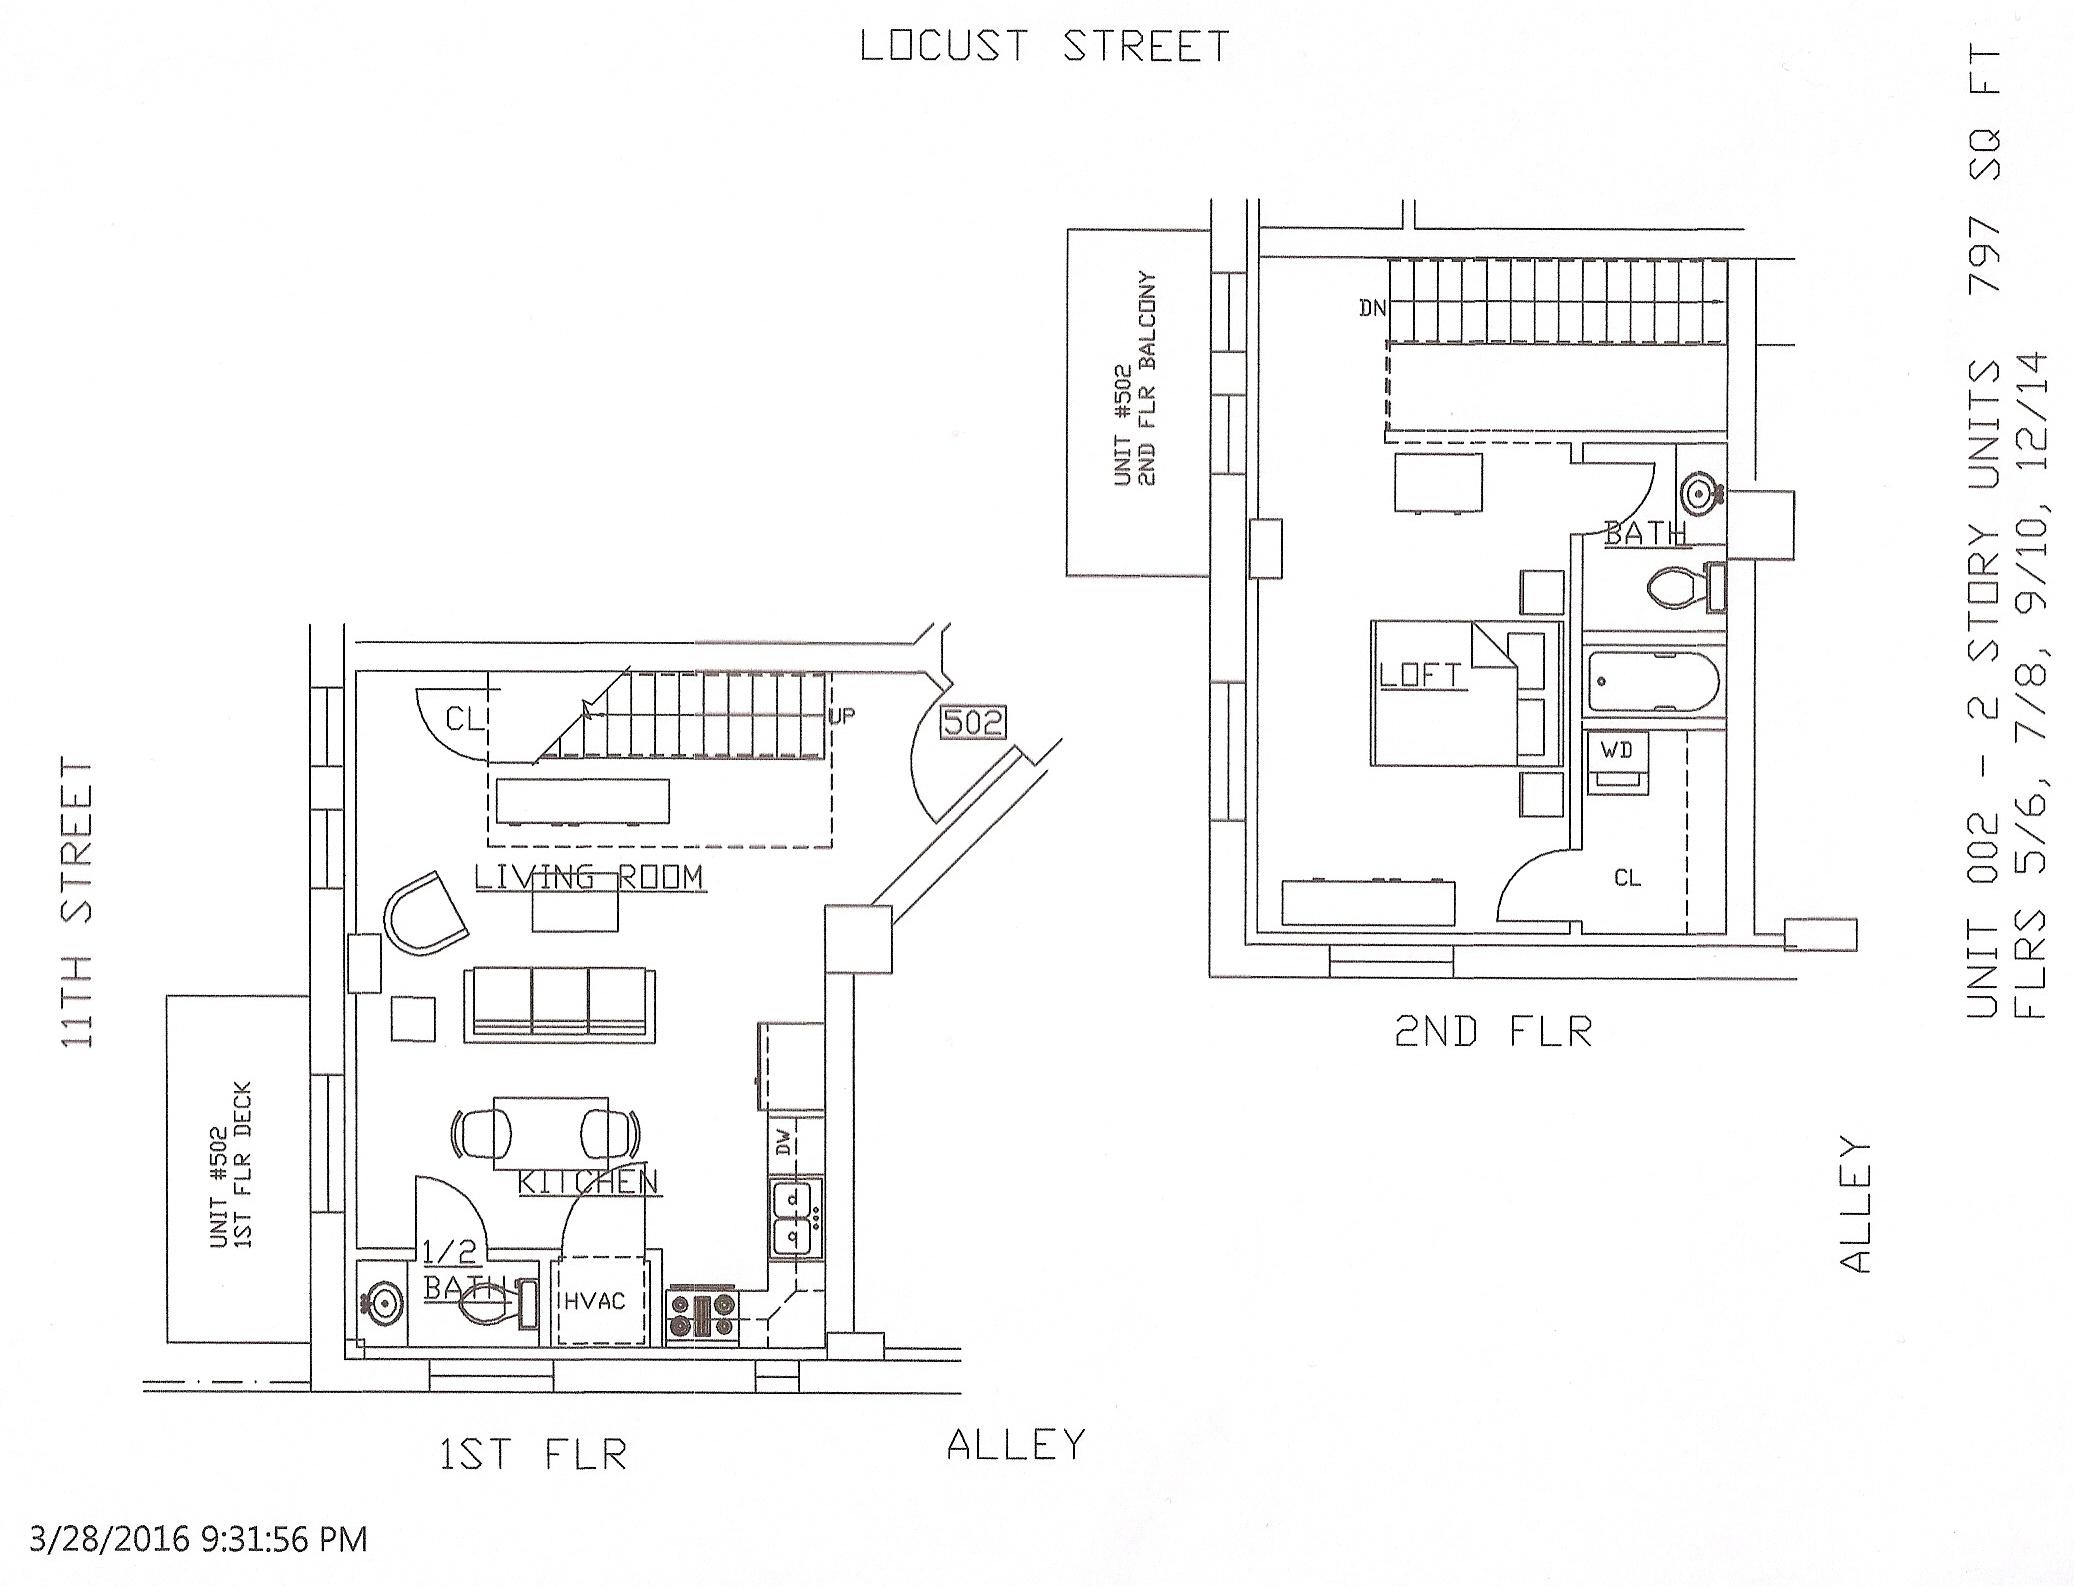 Unit 02, 797 Square Feet